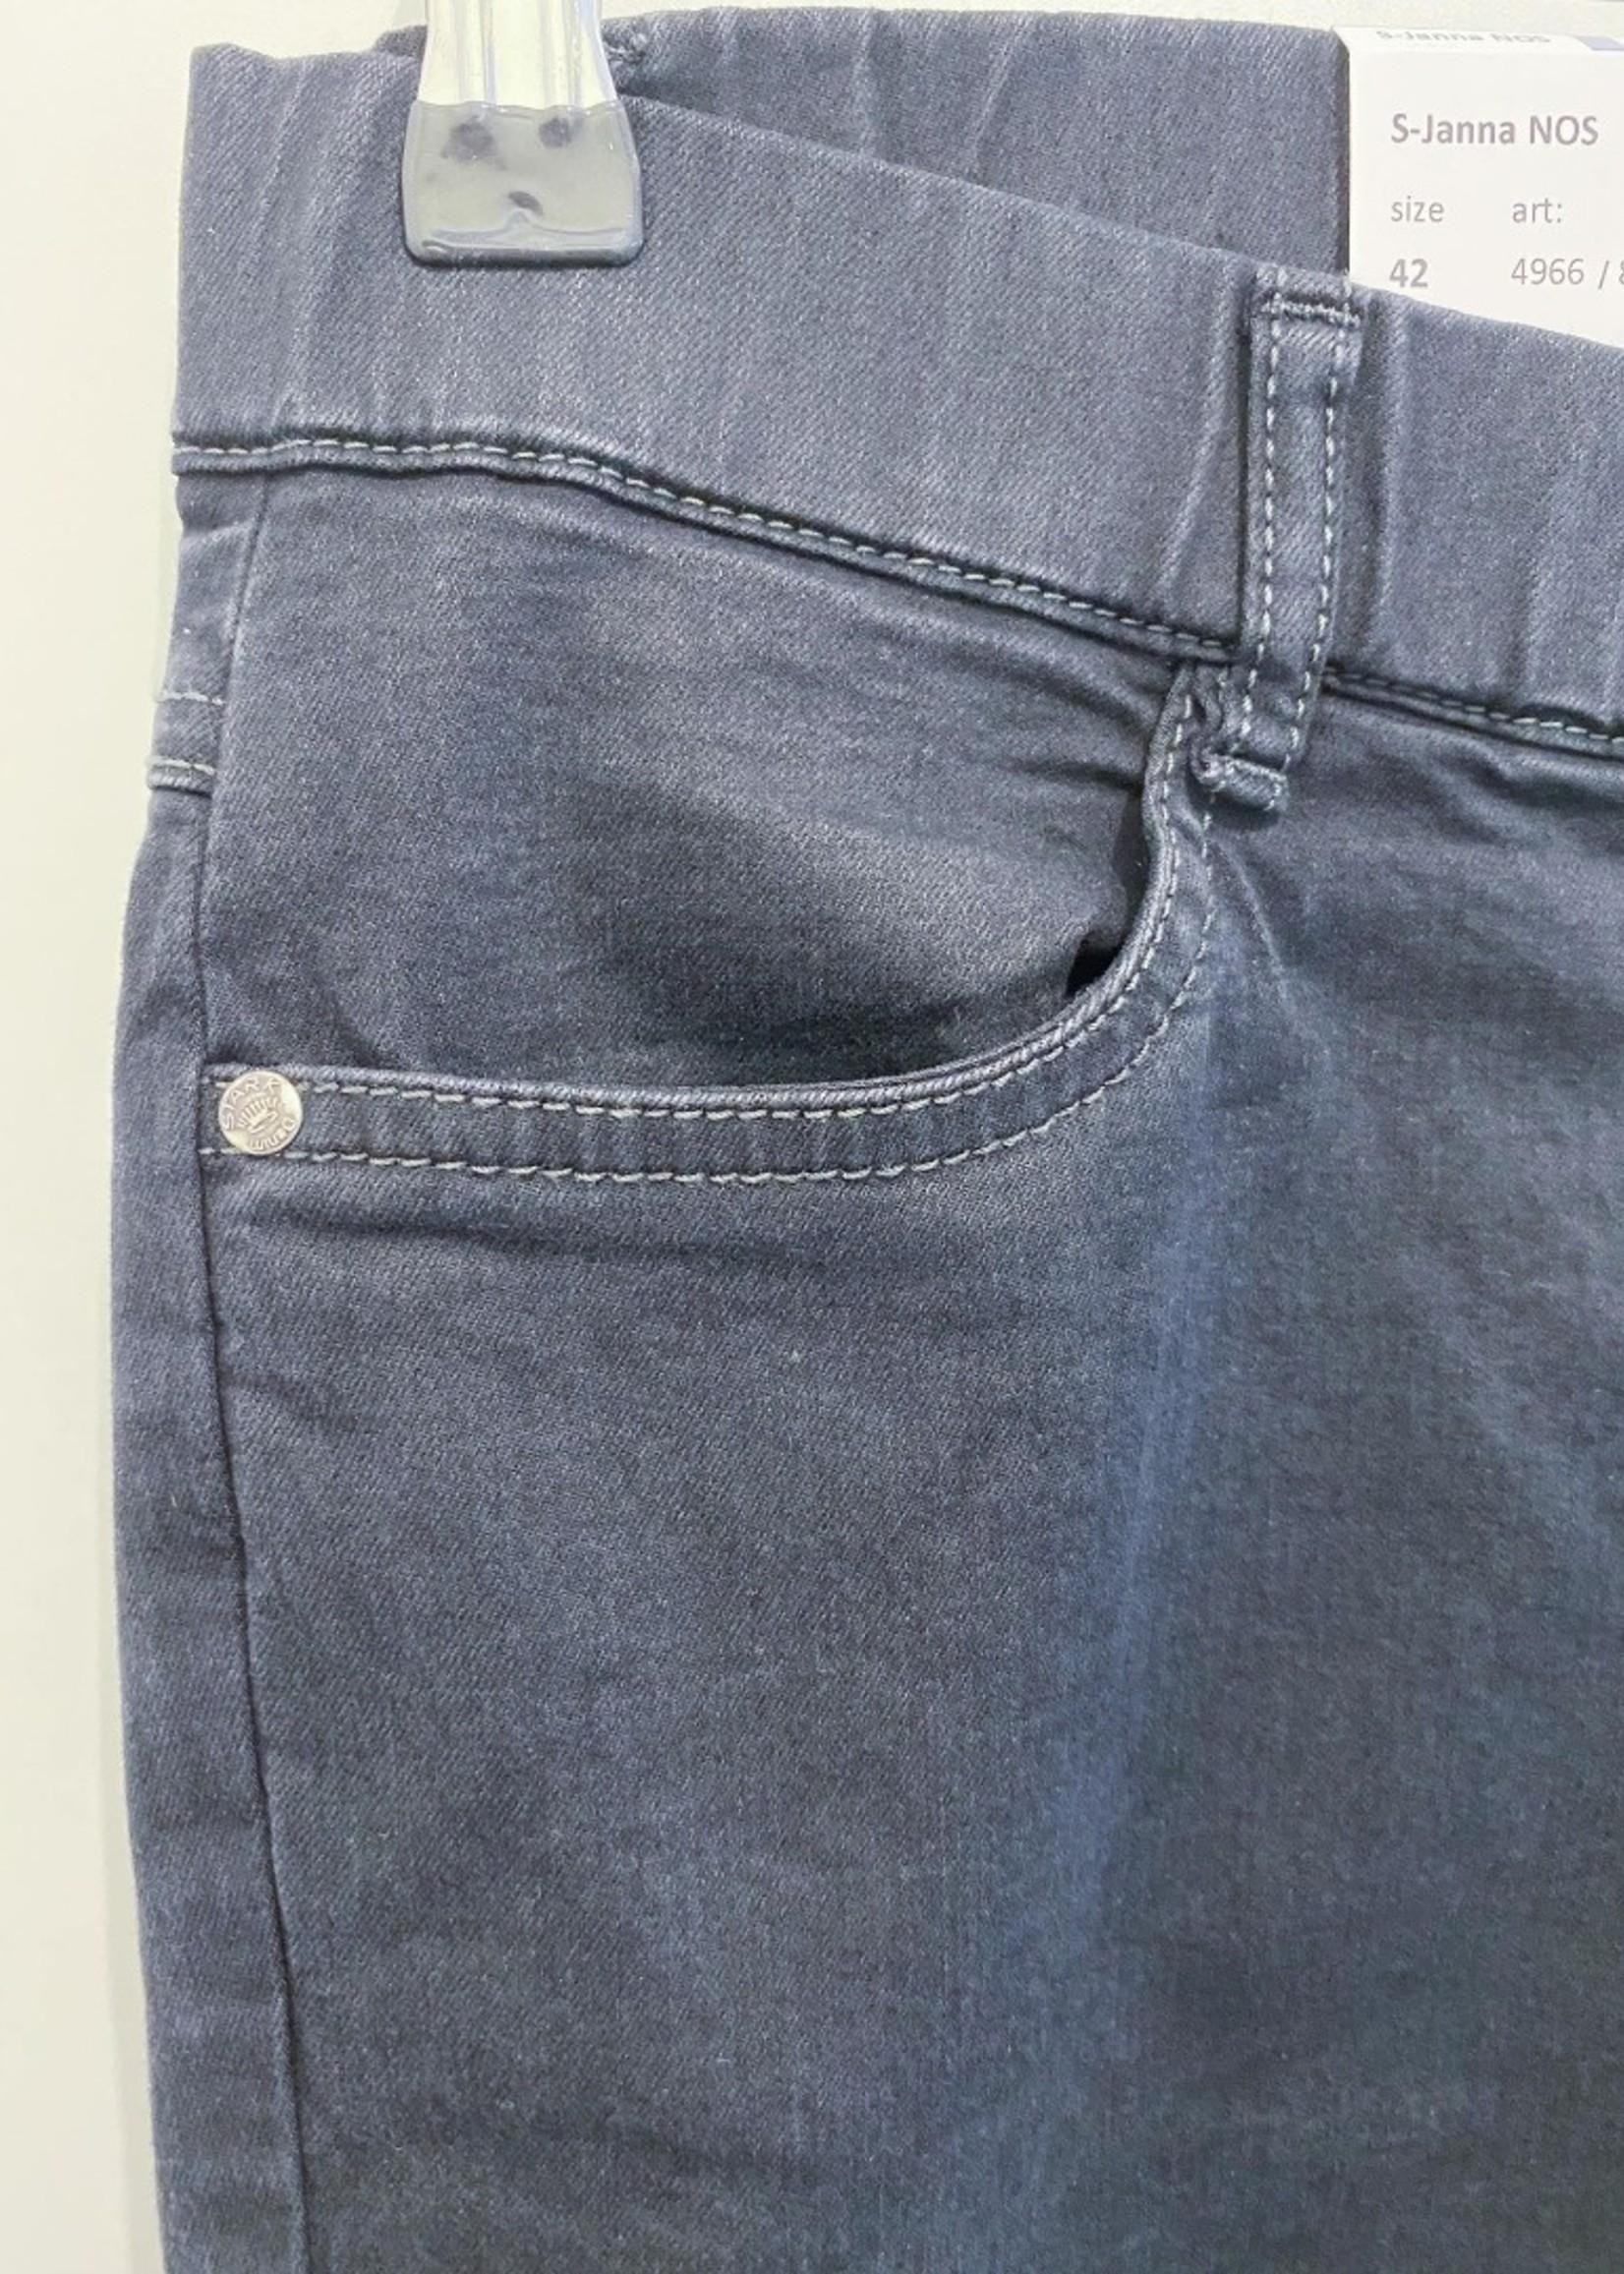 Stark Stark S-Janna Jeans Black Washed